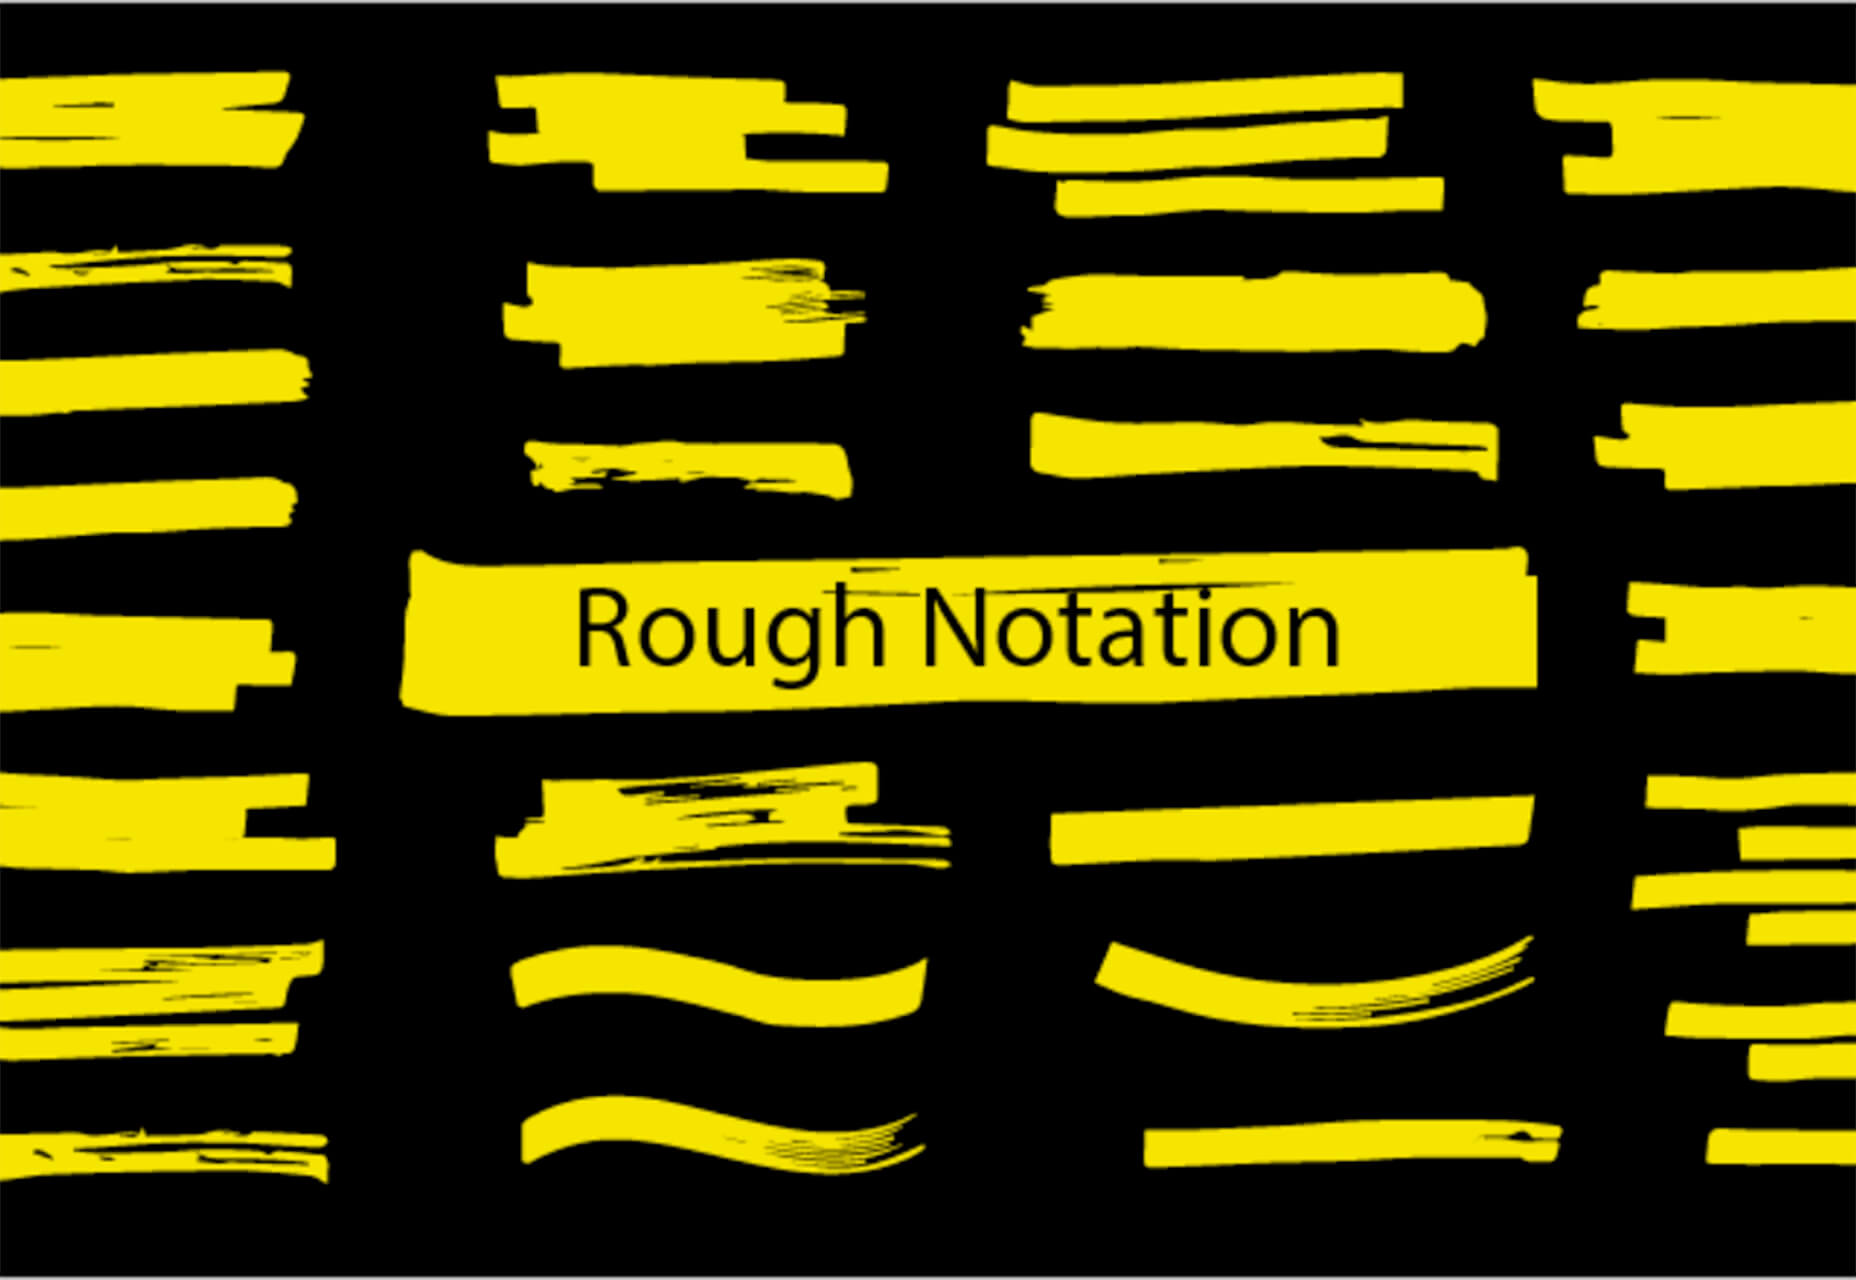 roughnotation